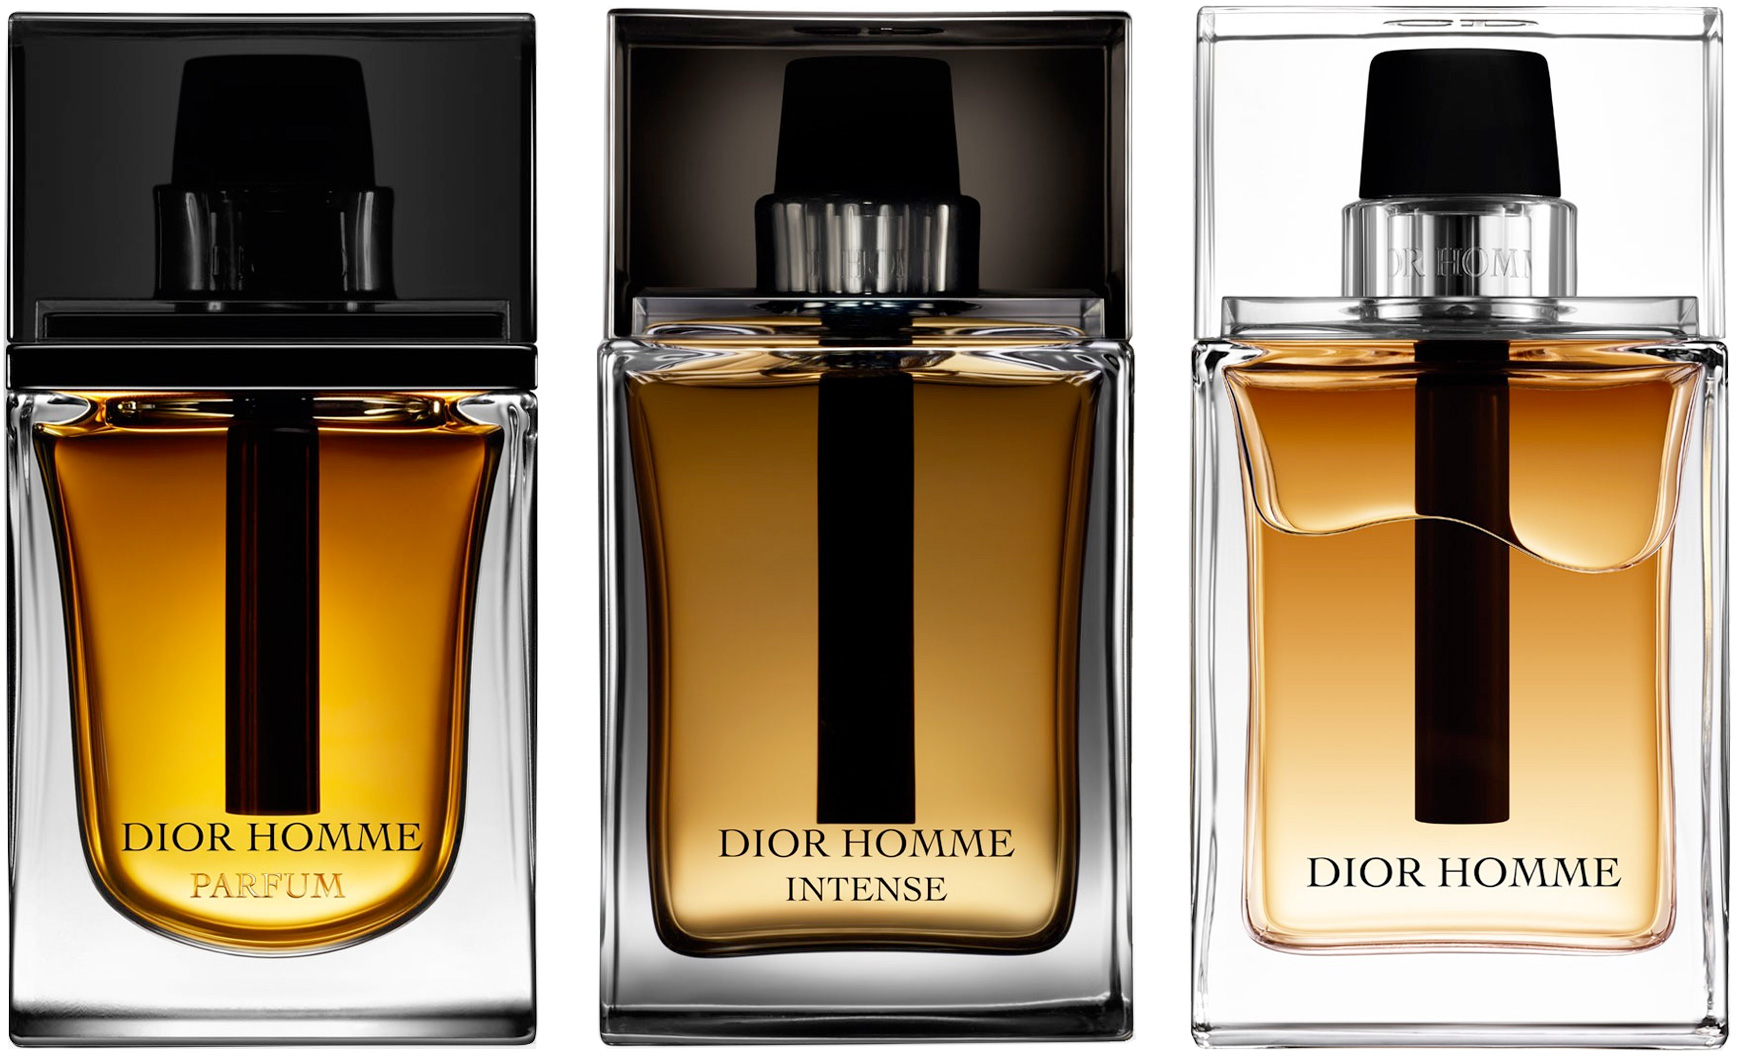 новая традиция Dior Homme Parfum новые ароматы